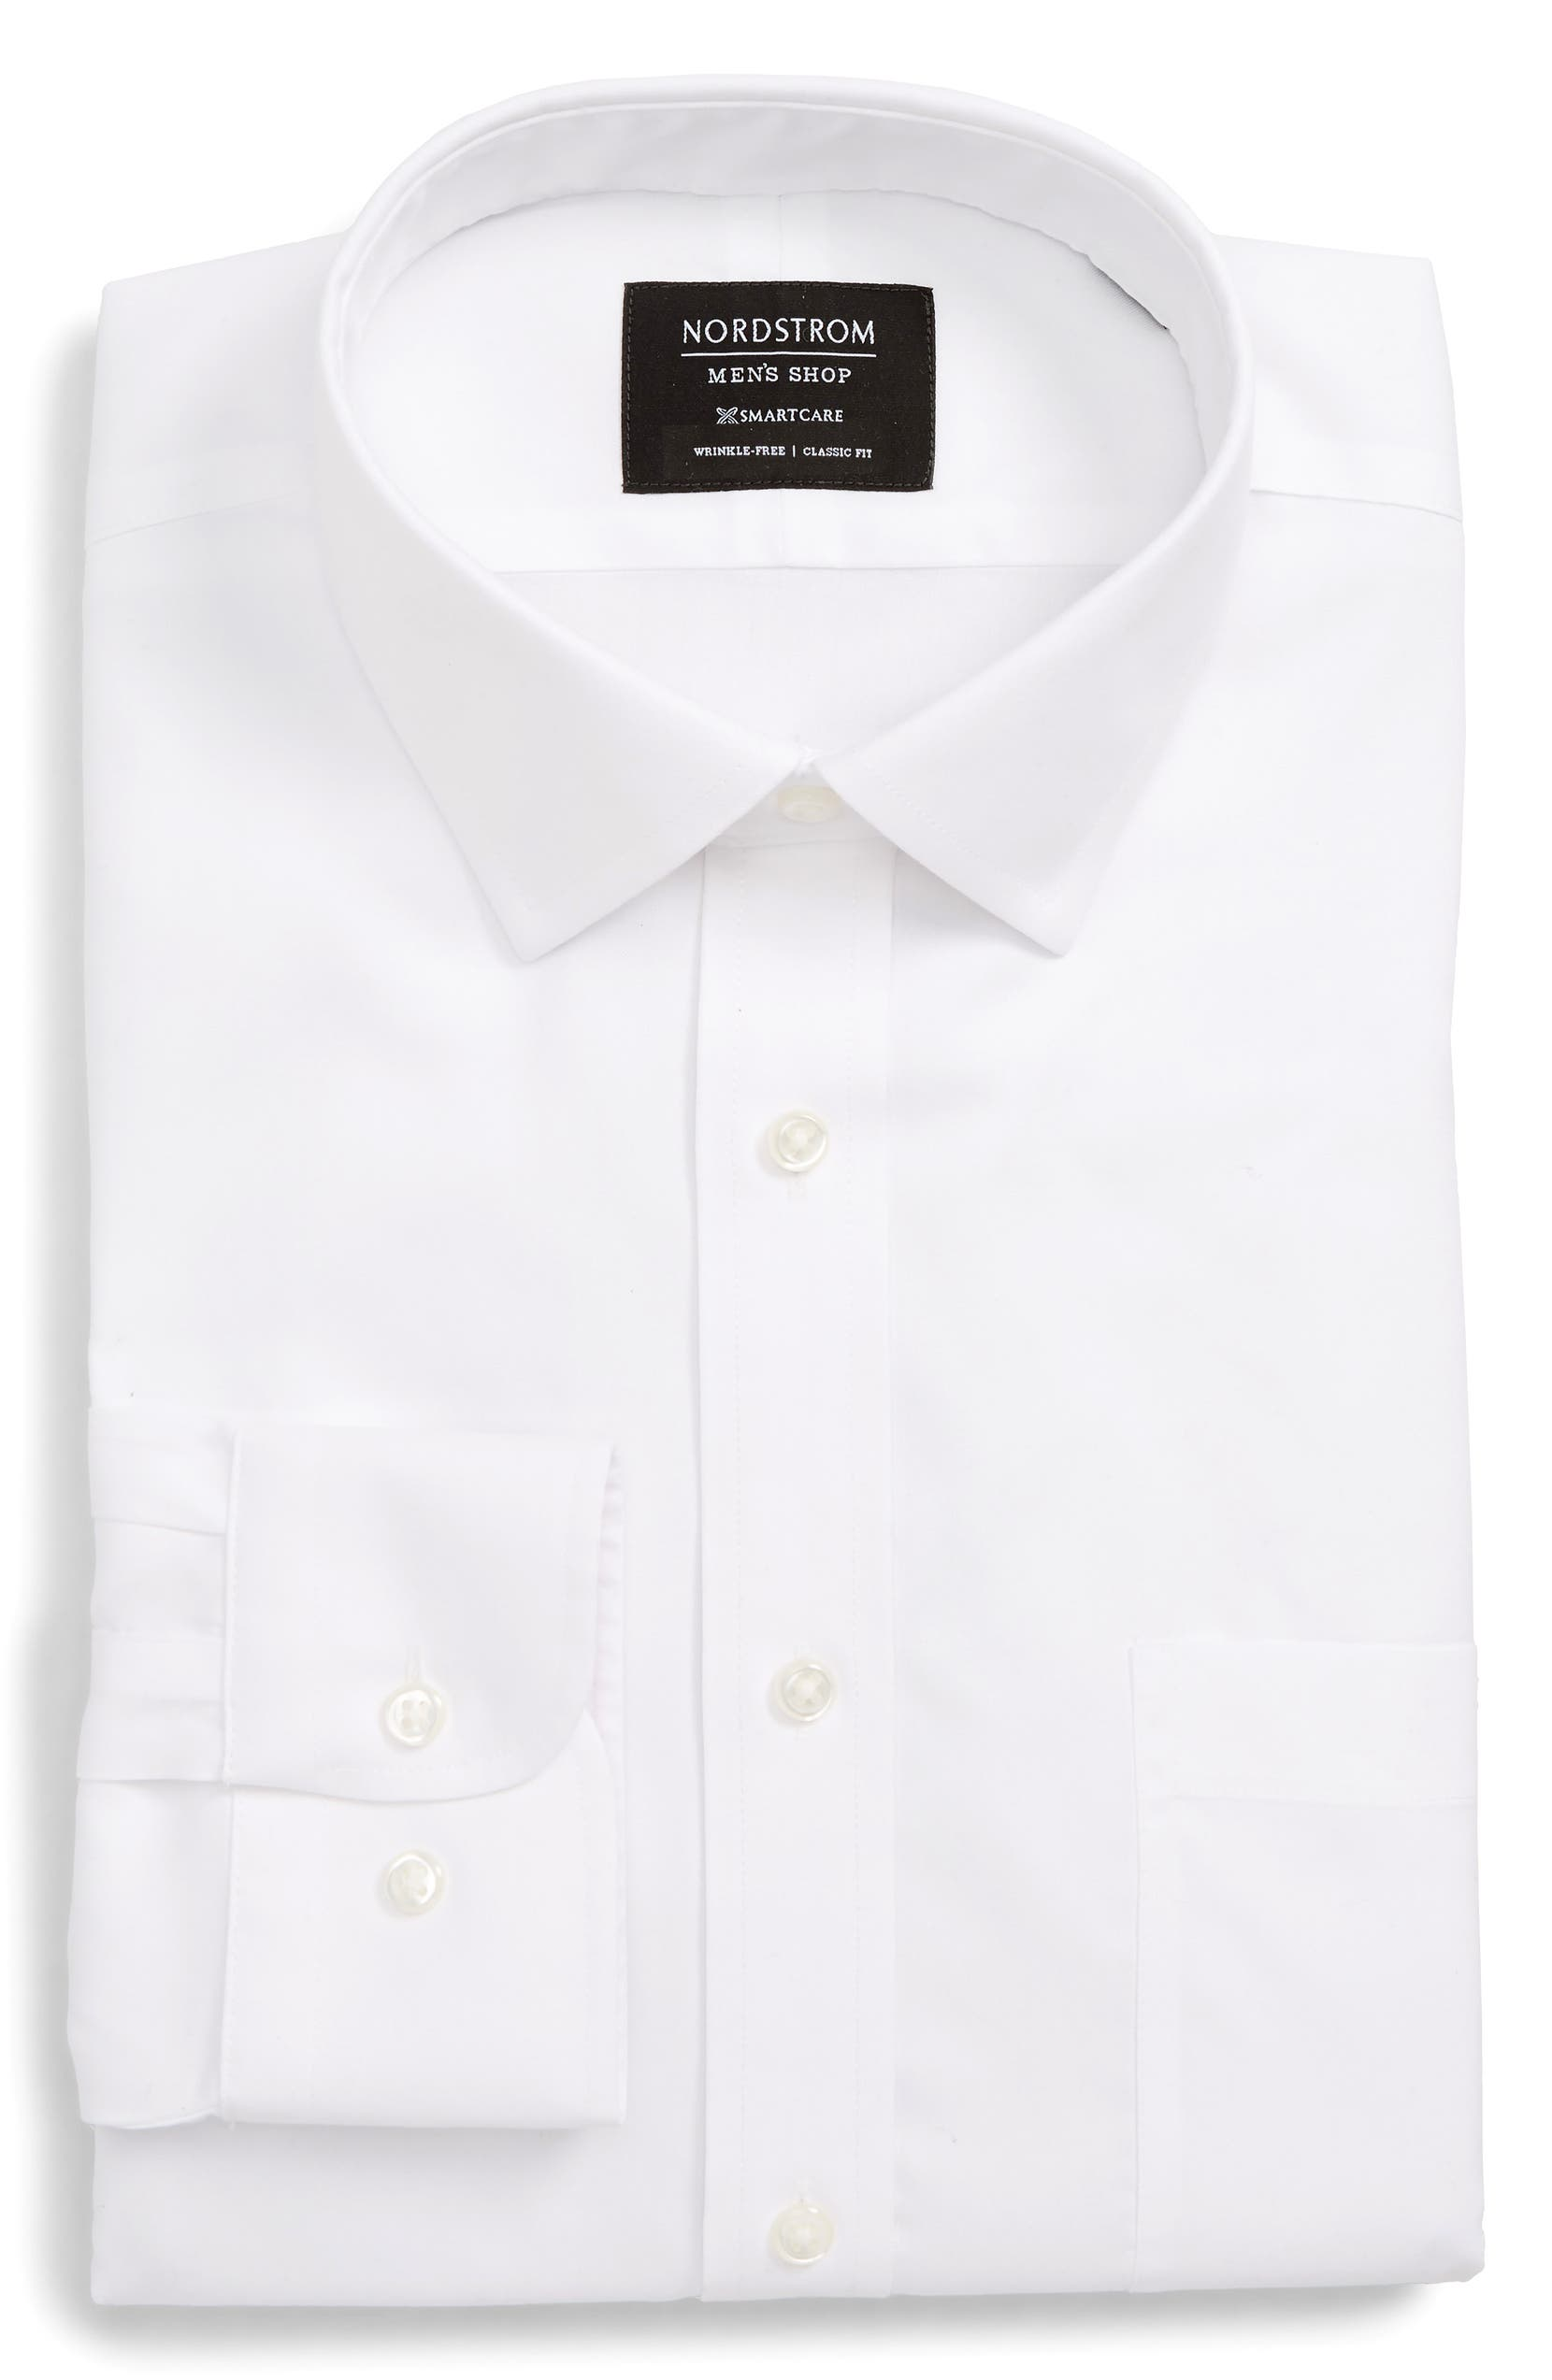 Nordstrom Mens Shop Smartcare Classic Fit Solid Dress Shirt